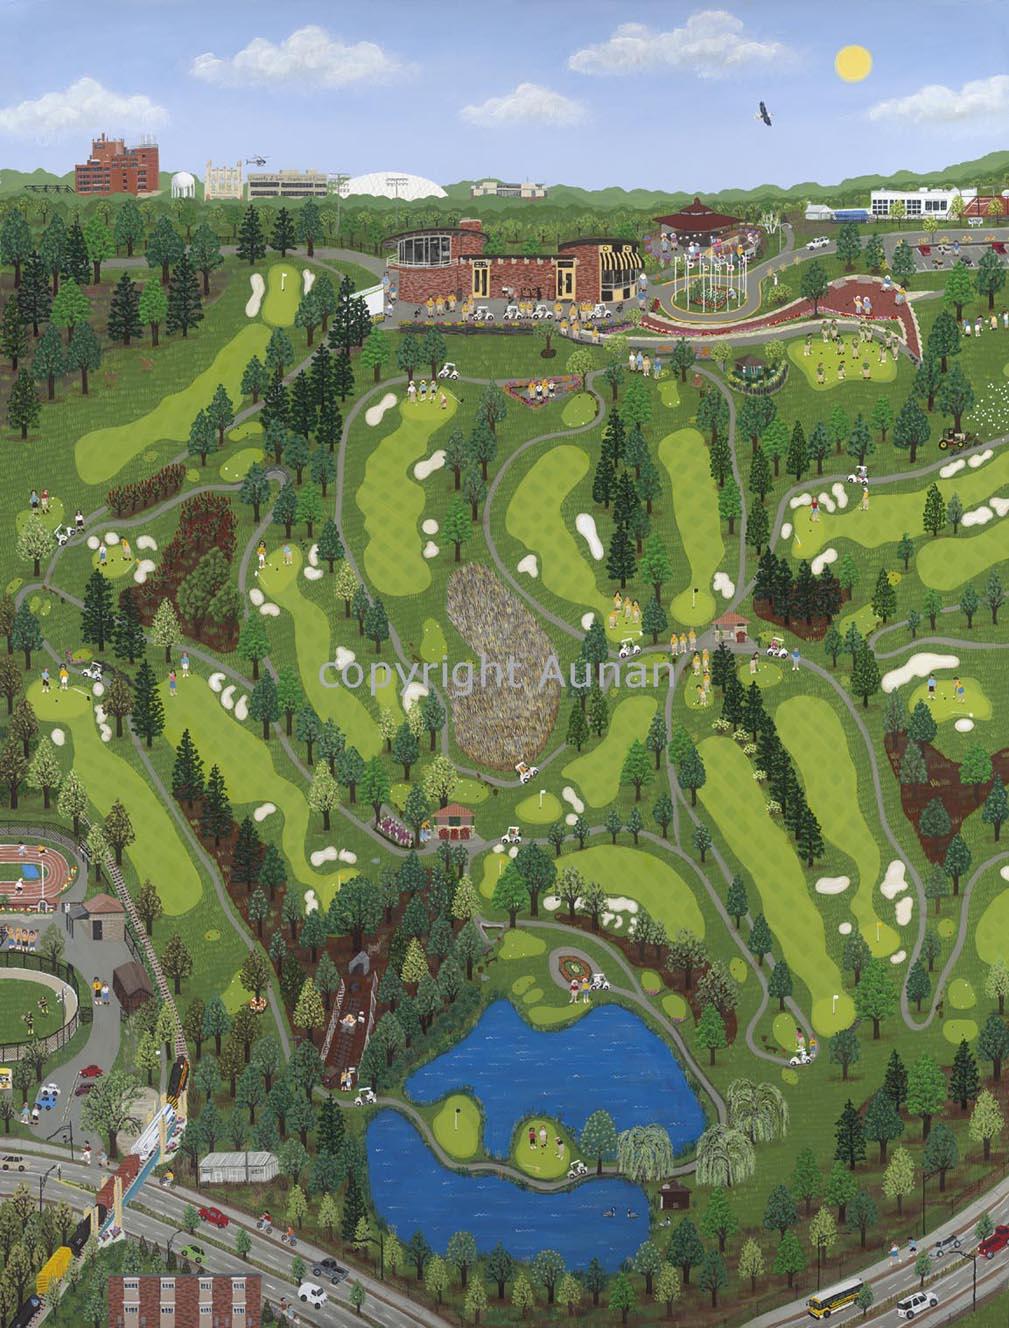 """Finkbine Golf Course"" Iowa City, Iowa - Finkbine Golf Course"